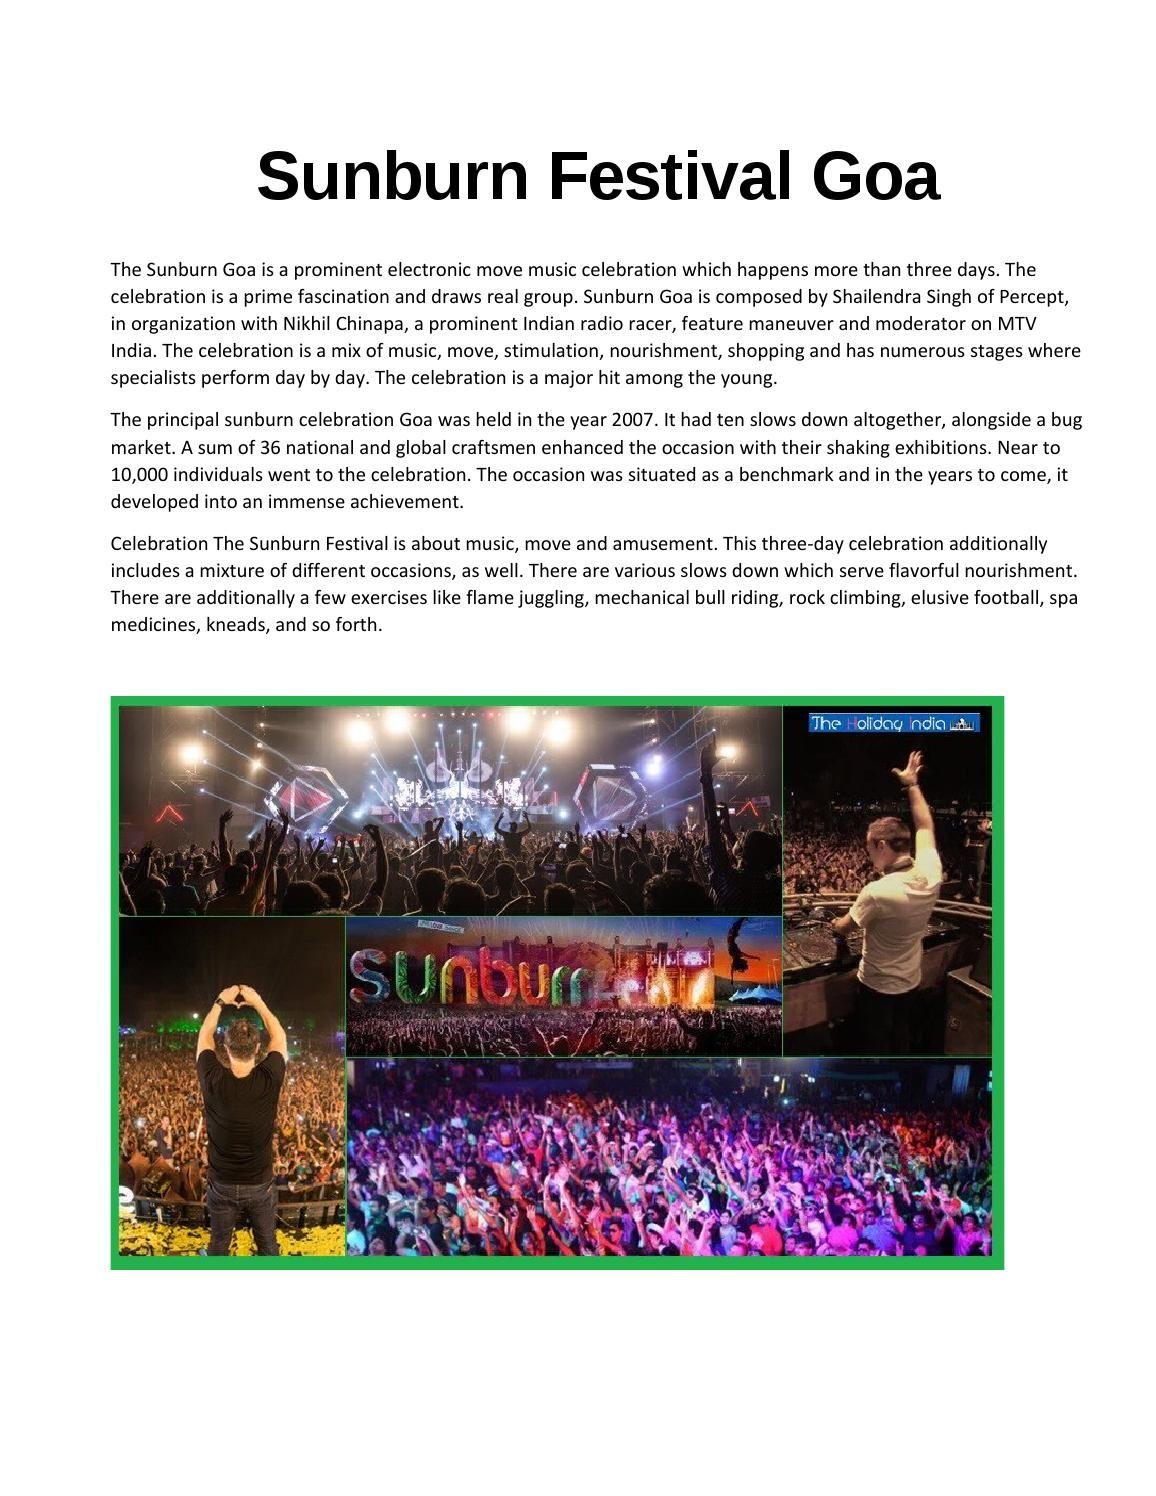 Sound System | Sunburn Festival | Latest Sunburn Pictures | Pinterest